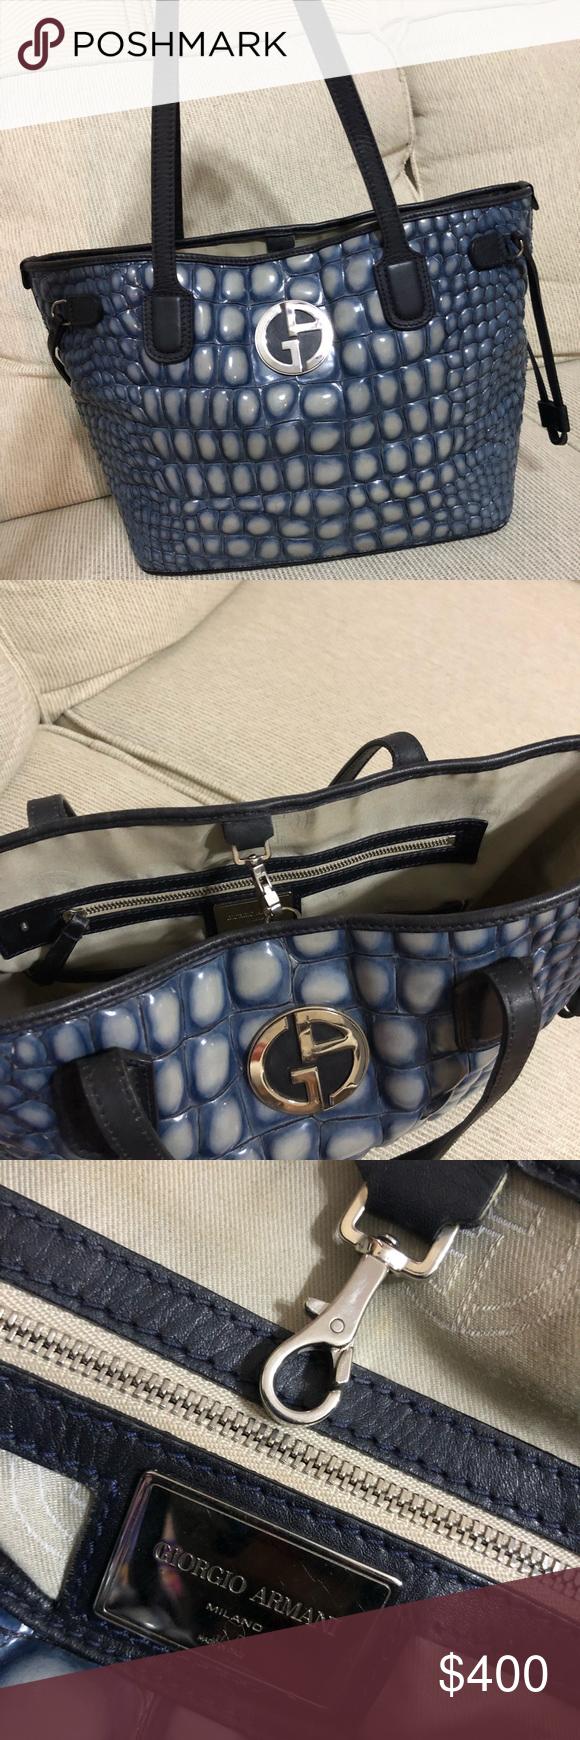 c8bf217b345 Armani bag Limited edition, Armani bag, made in Italy Giorgio Armani Bags  Shoulder Bags